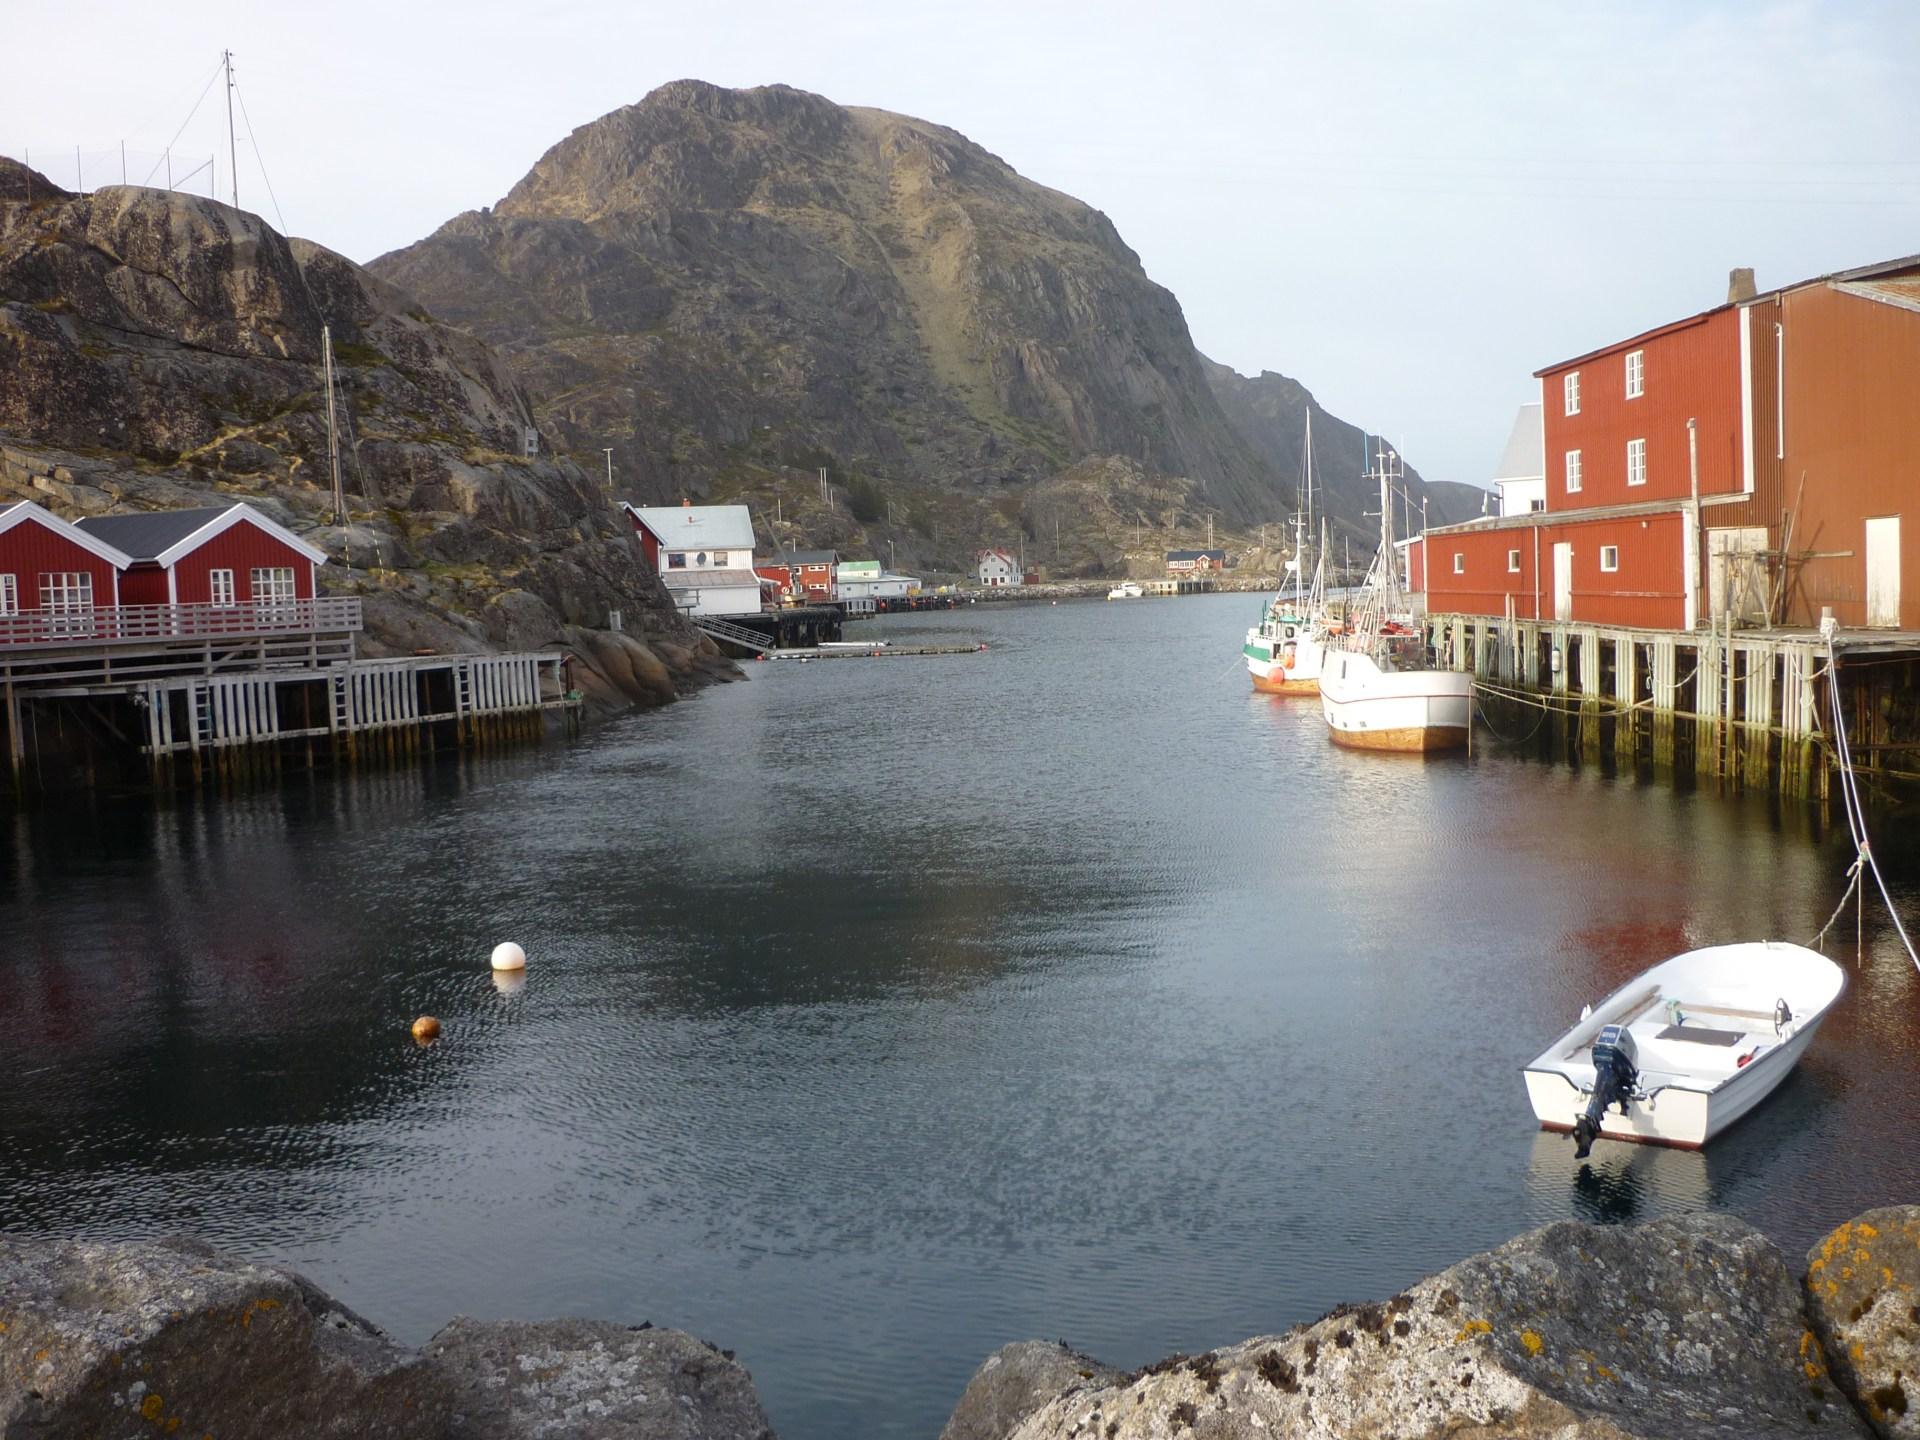 destinazioni estate 2019: Leknes isole lofoten